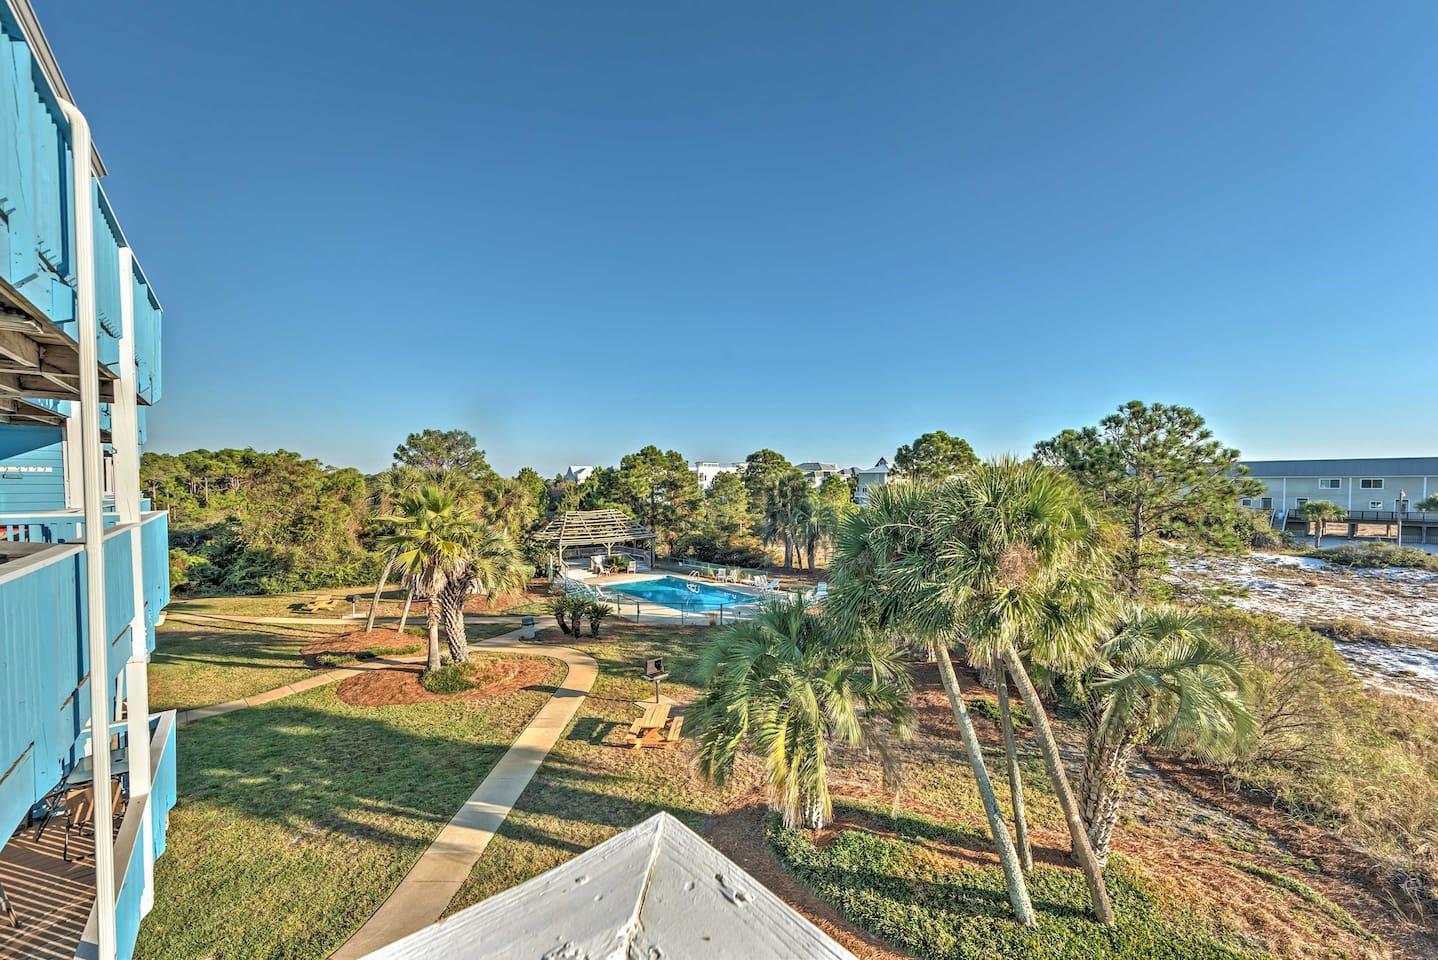 Experience the best of Florida at this Santa Rosa Beach vacation rental studio!